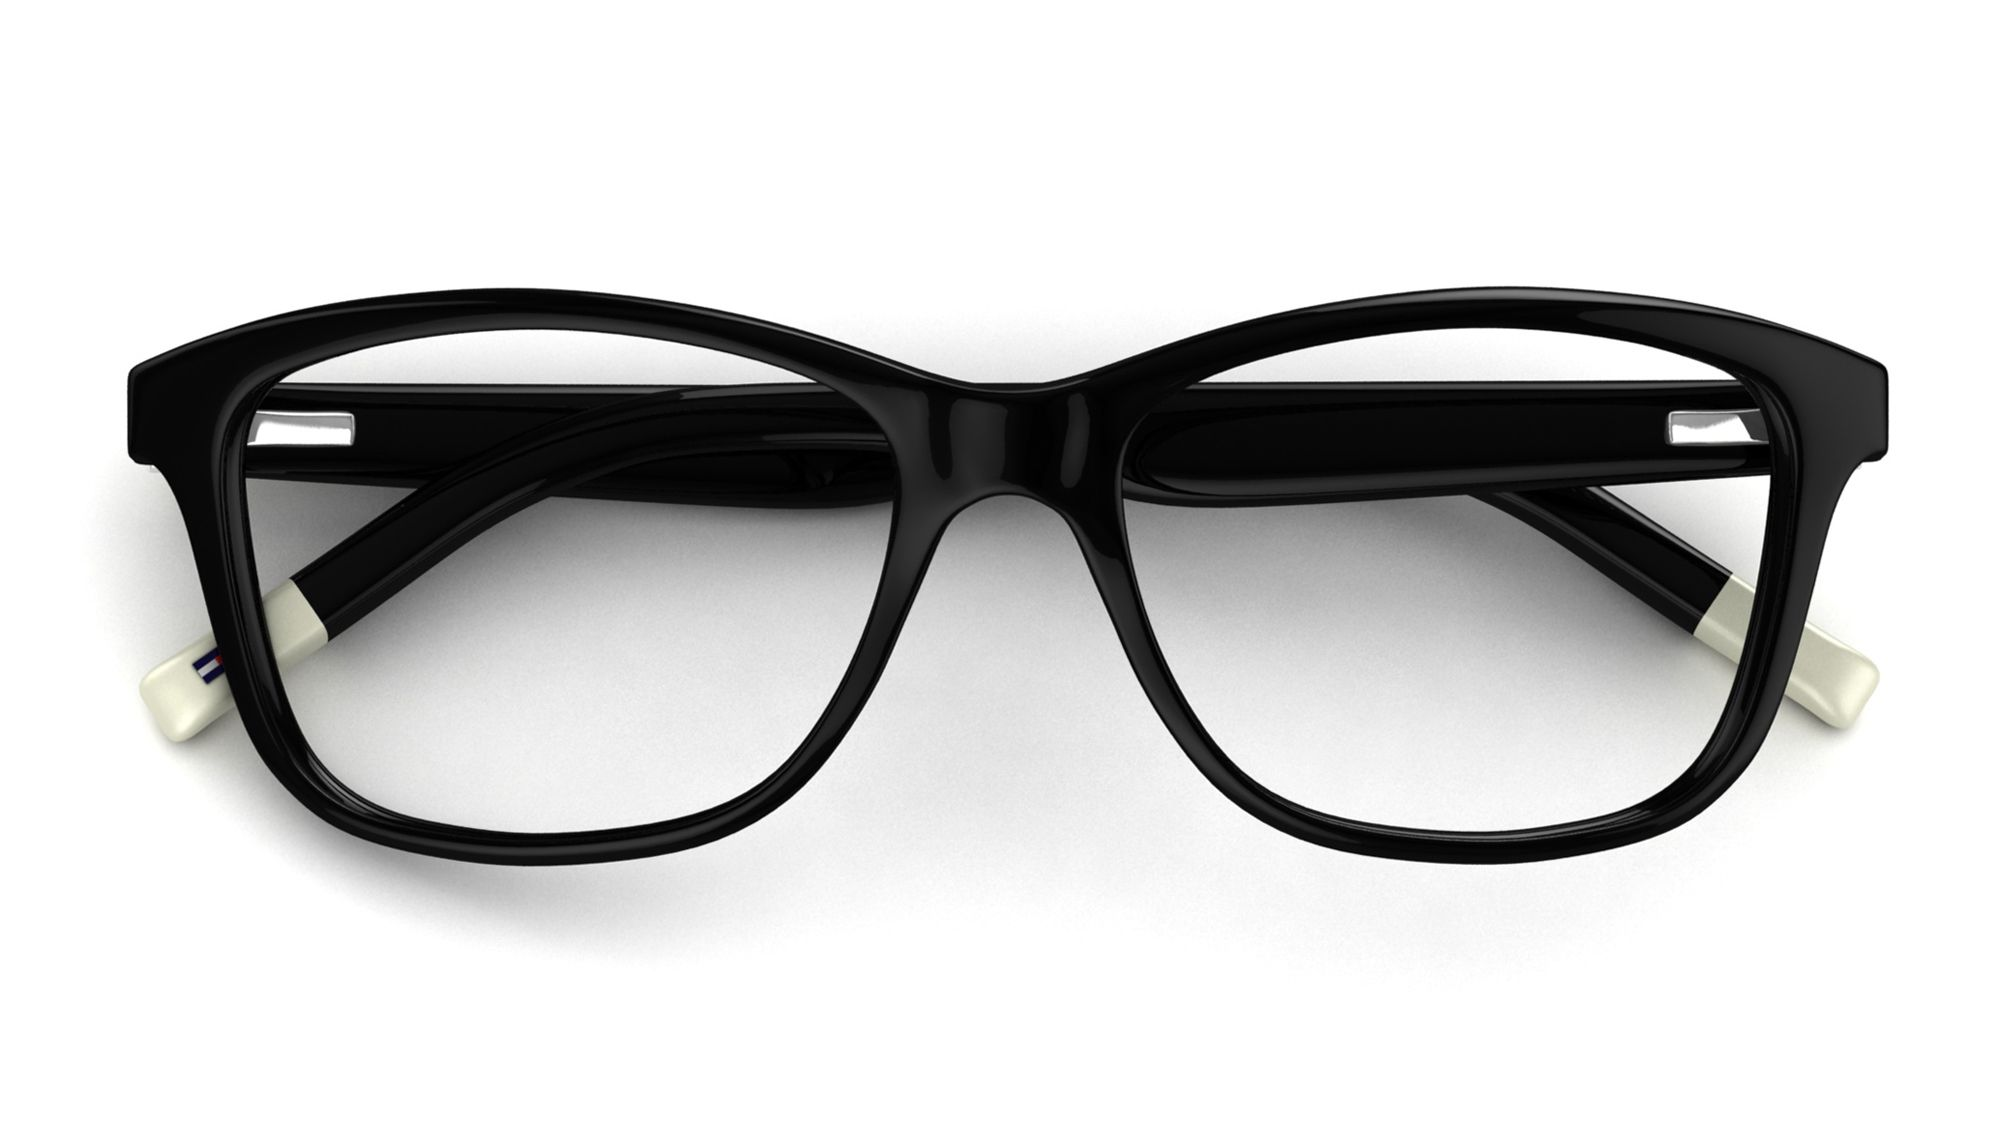 2278ba8fe4 Tommy Hilfiger glasses - TH 66